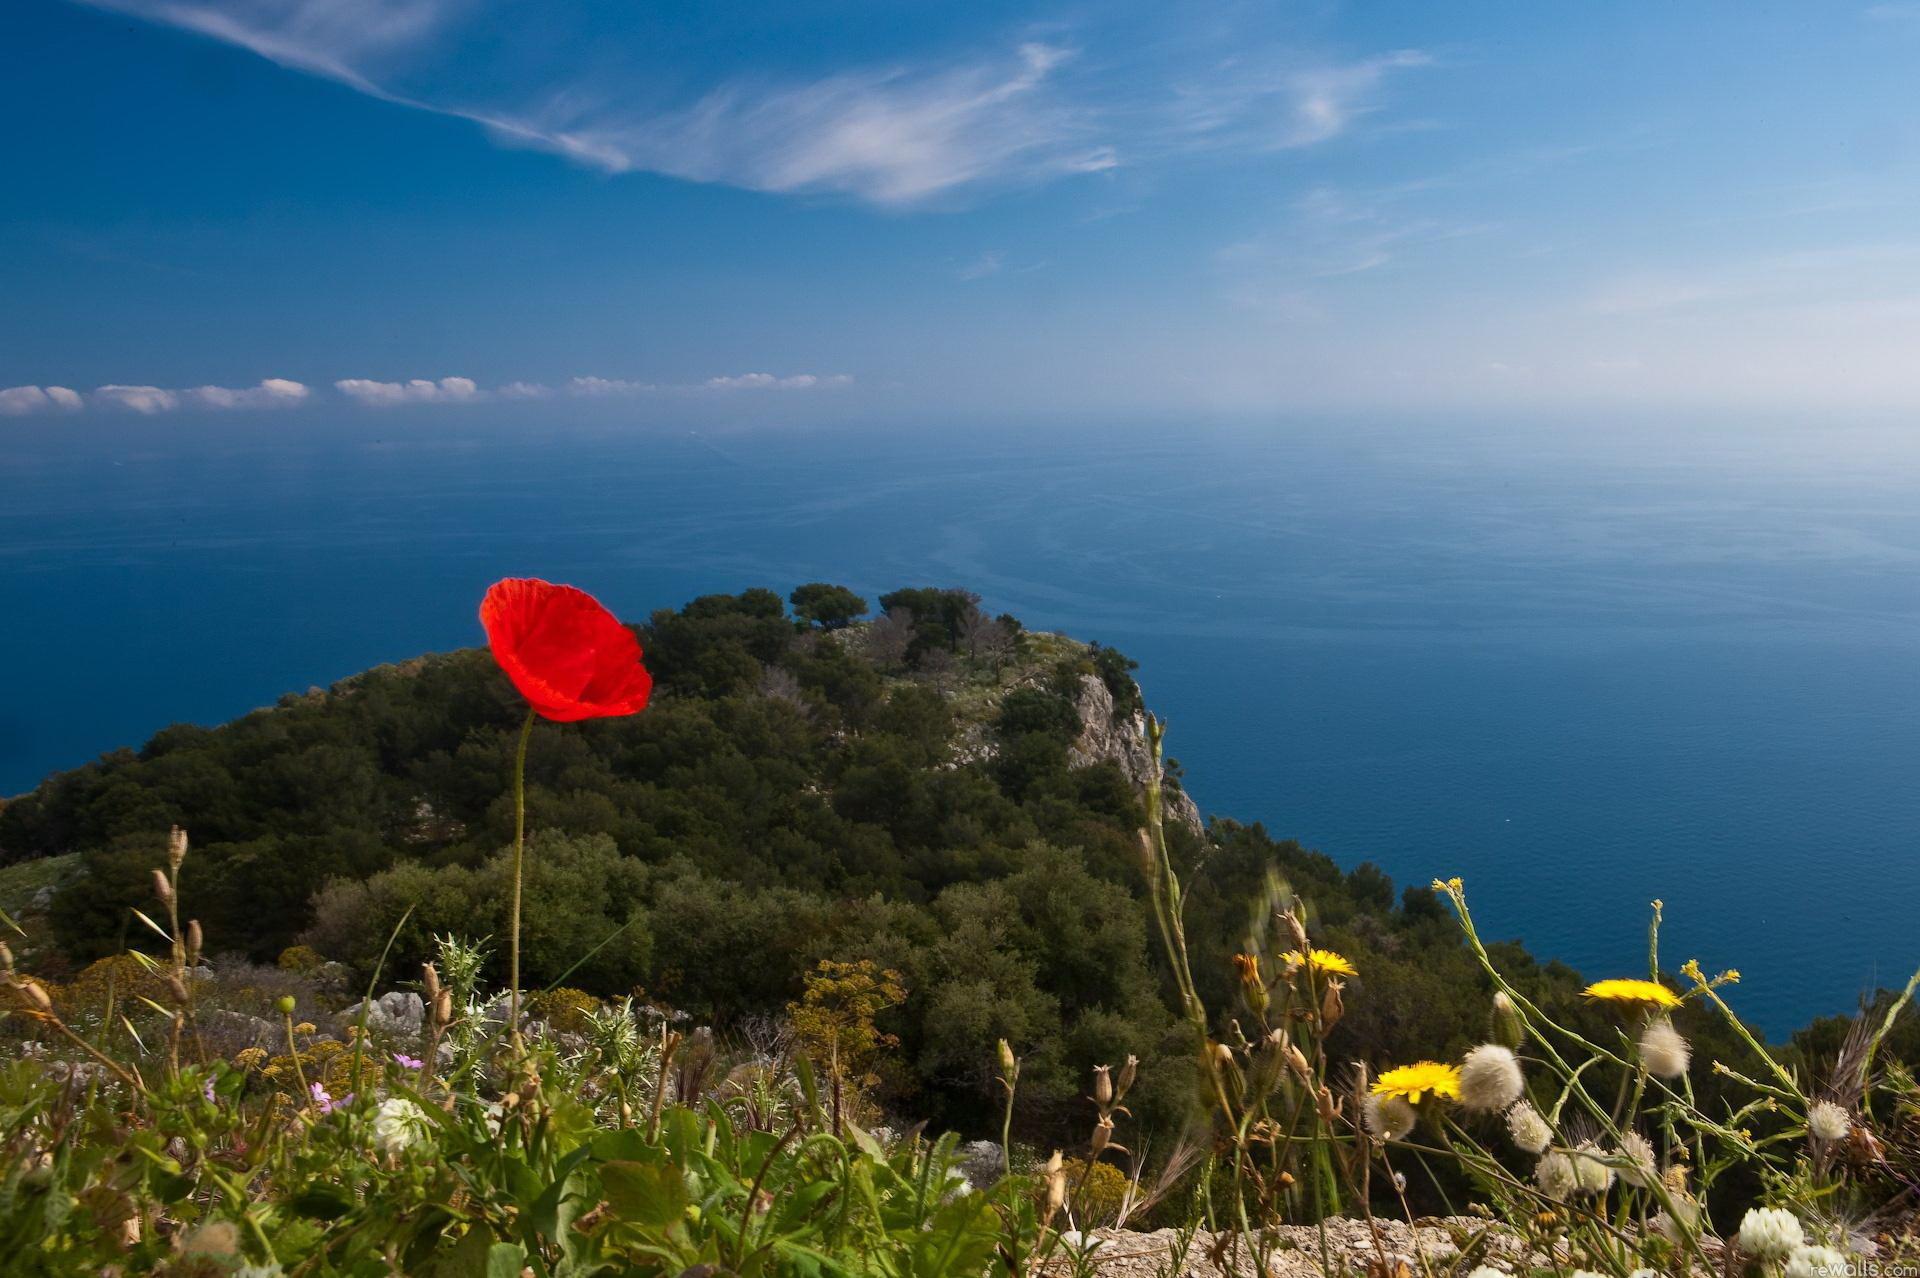 Природа, пейзаж Лето цветок, красный ...: priroda-foto.ucoz.ru/photo/leto/cvetok_krasnyj_vid_more_gory_nebo...